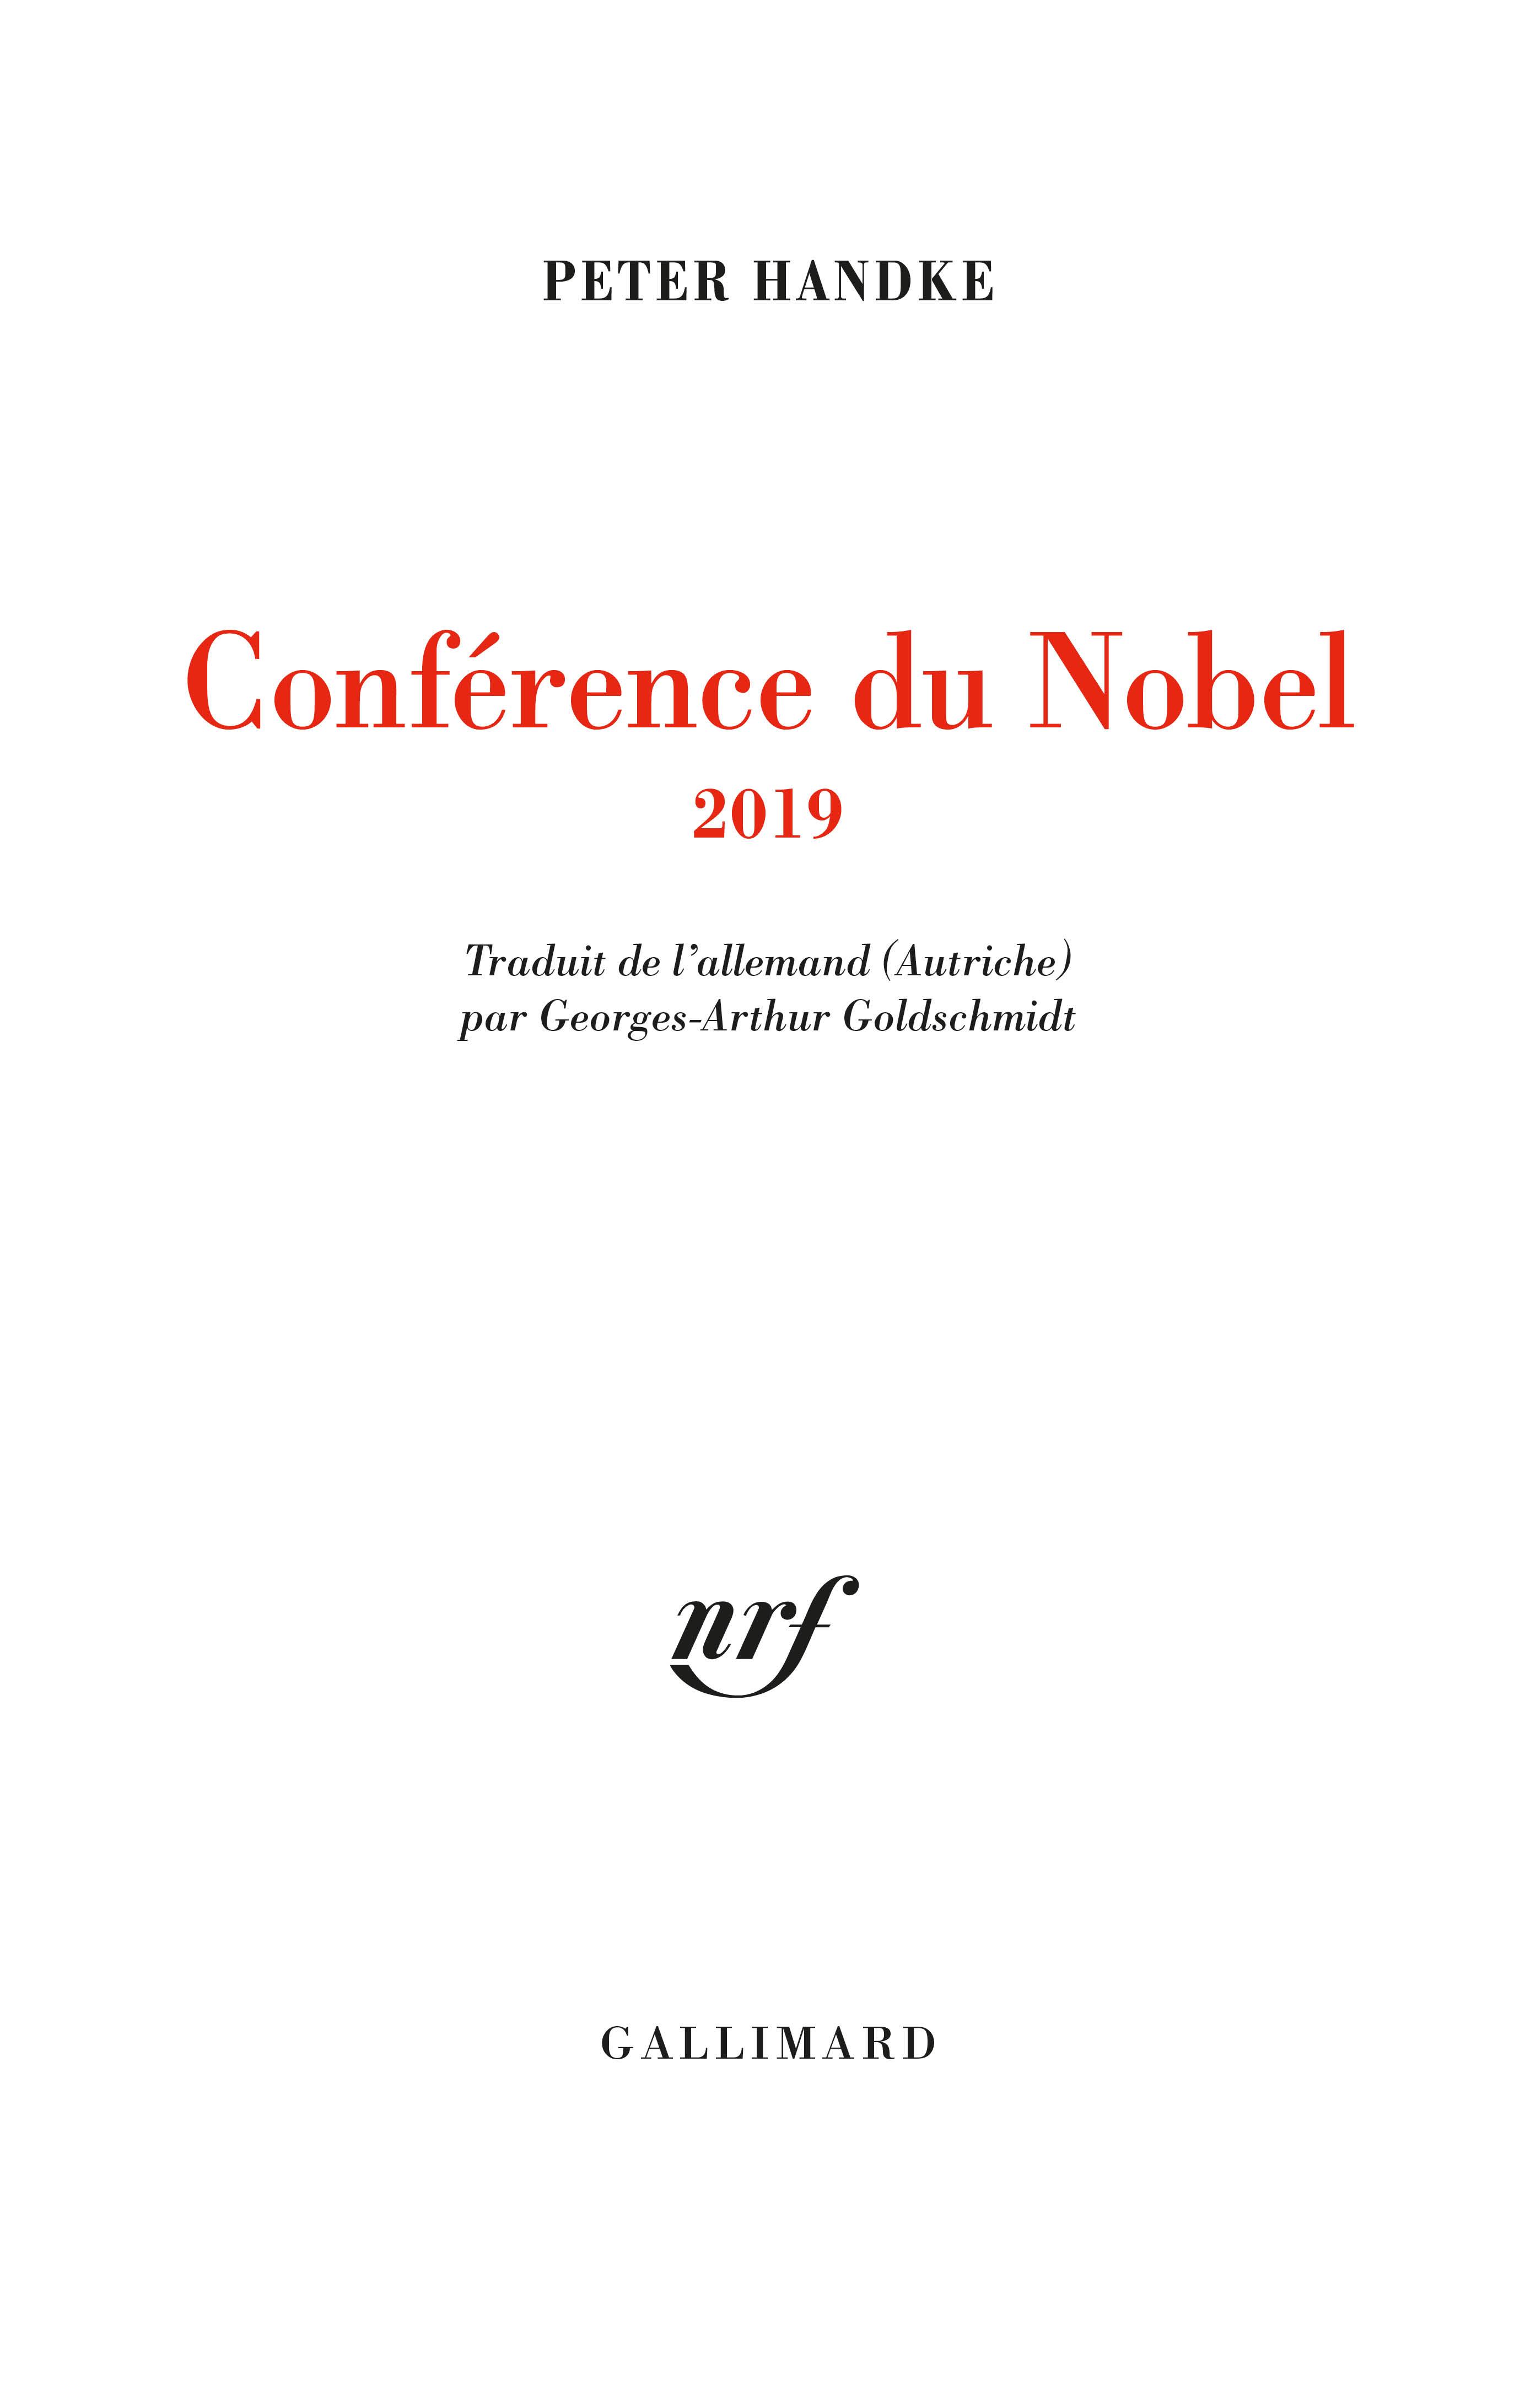 P. Handke, Conférence du Nobel